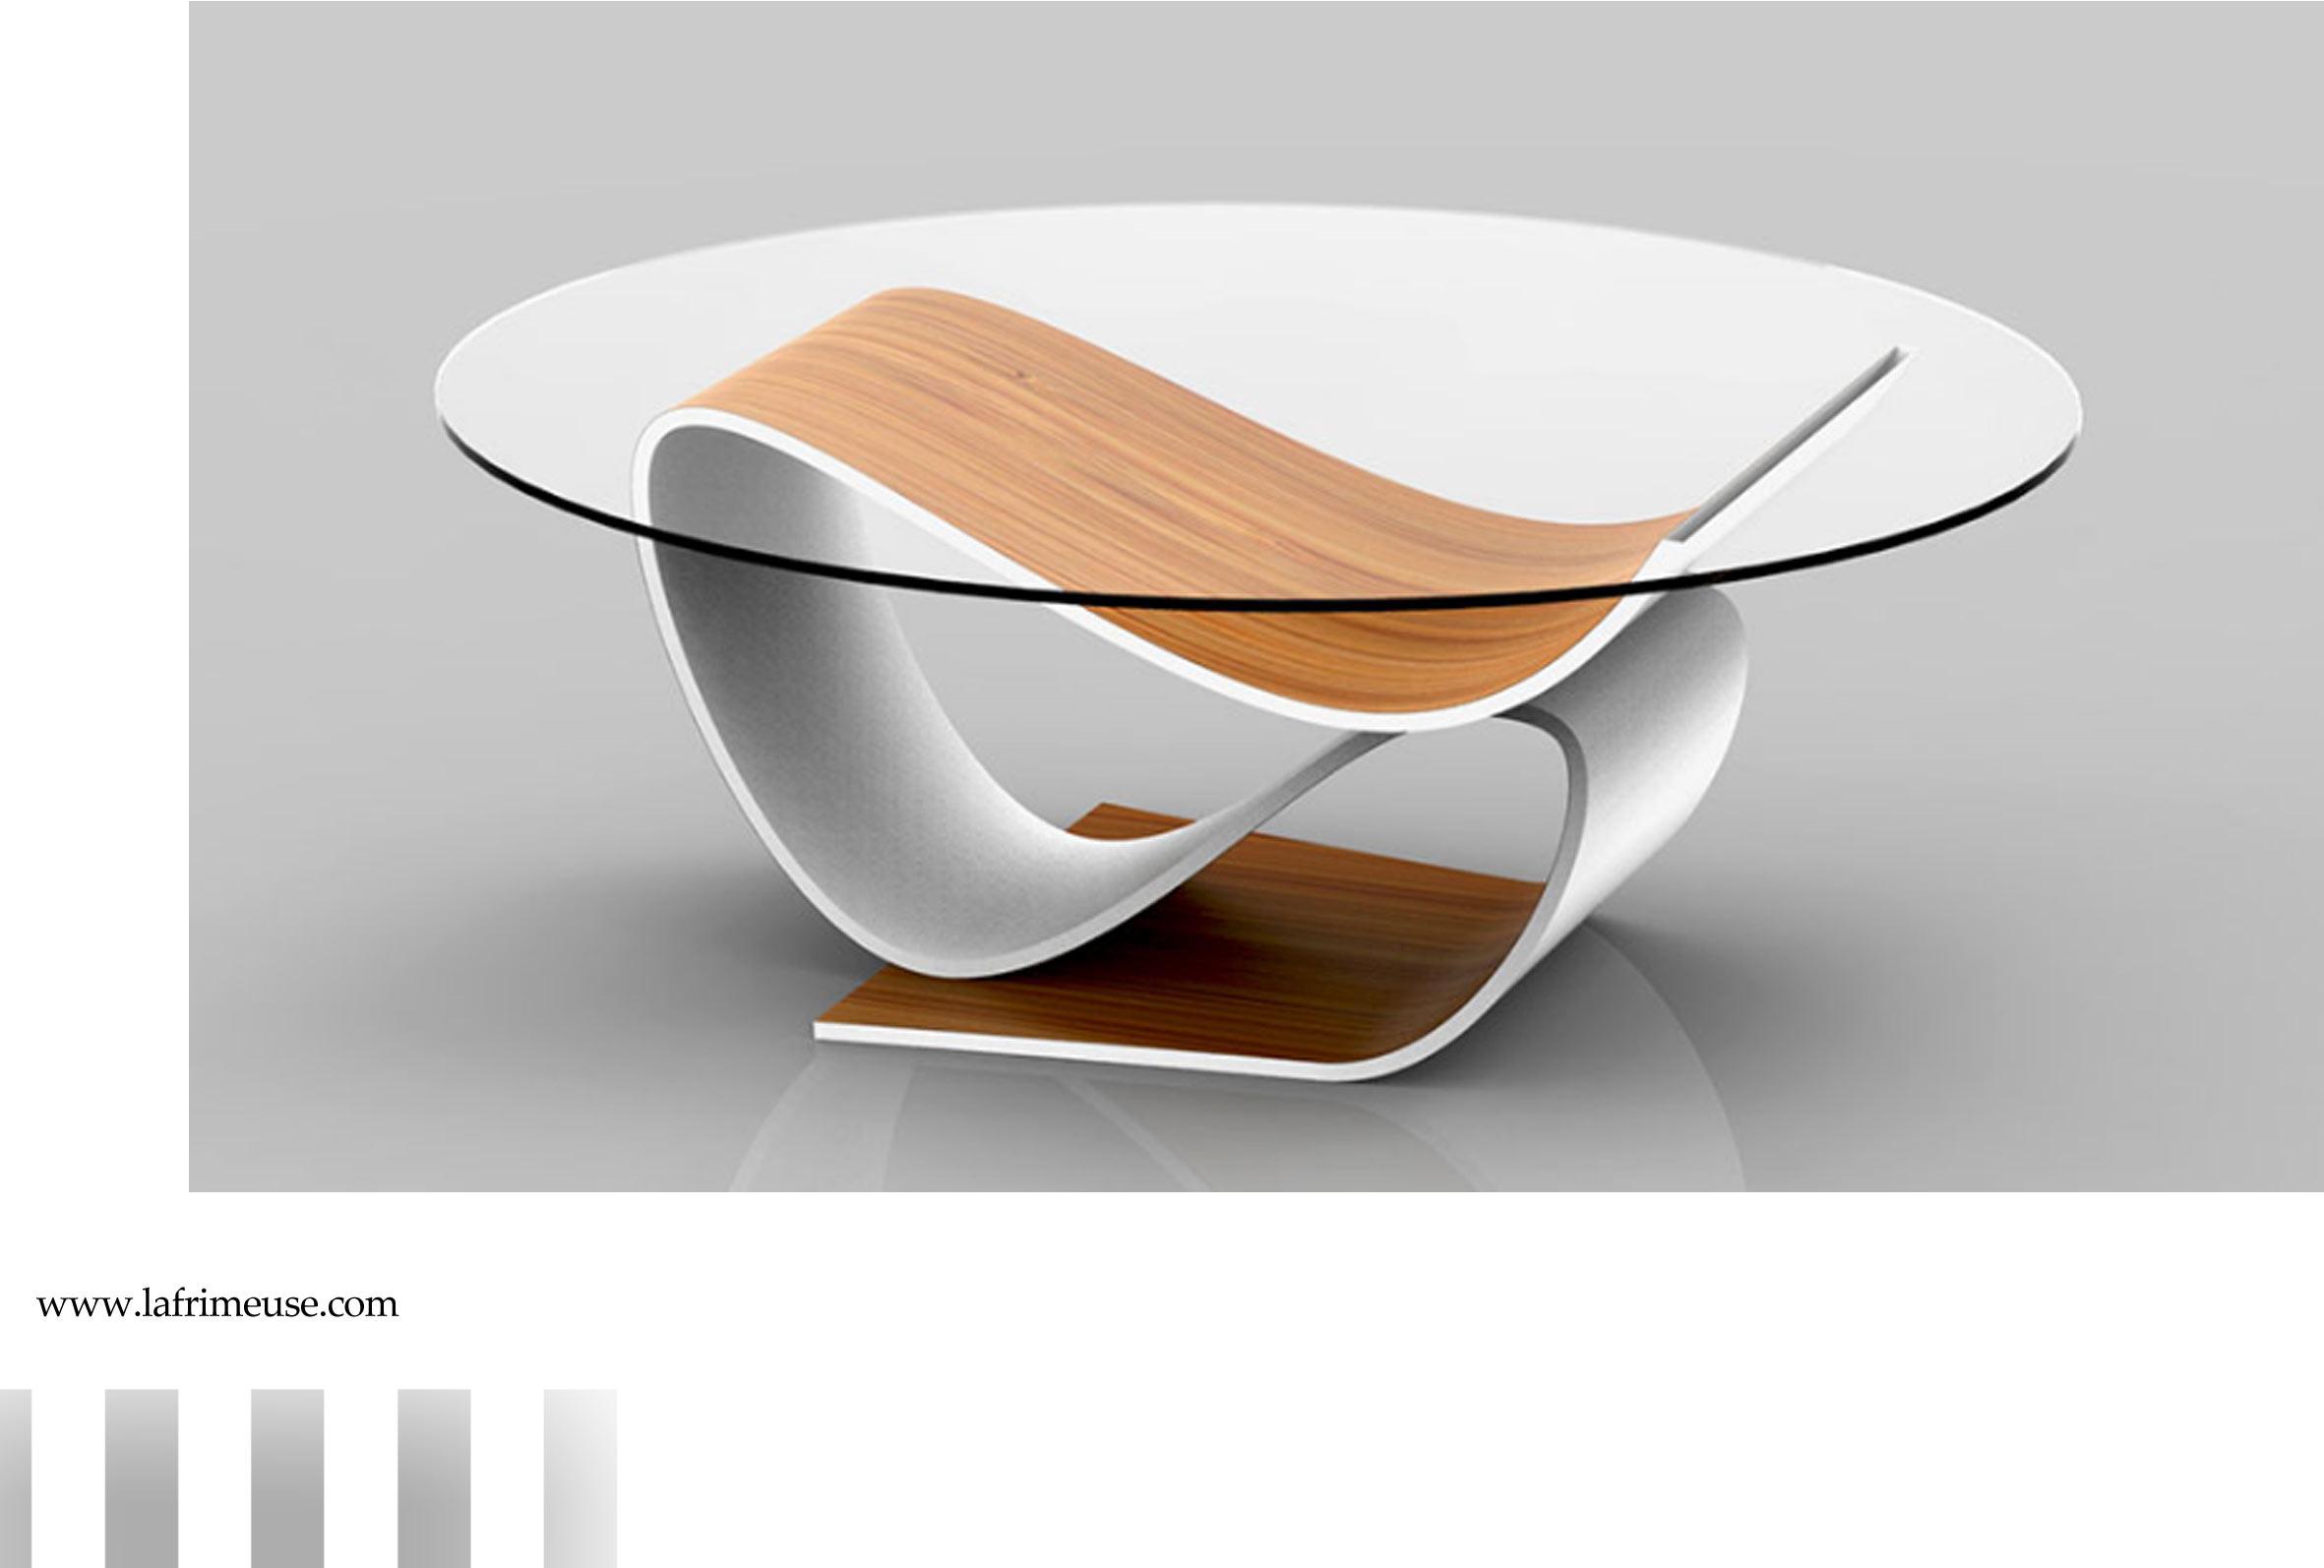 7 pierre cabrera la frimeuse. Black Bedroom Furniture Sets. Home Design Ideas